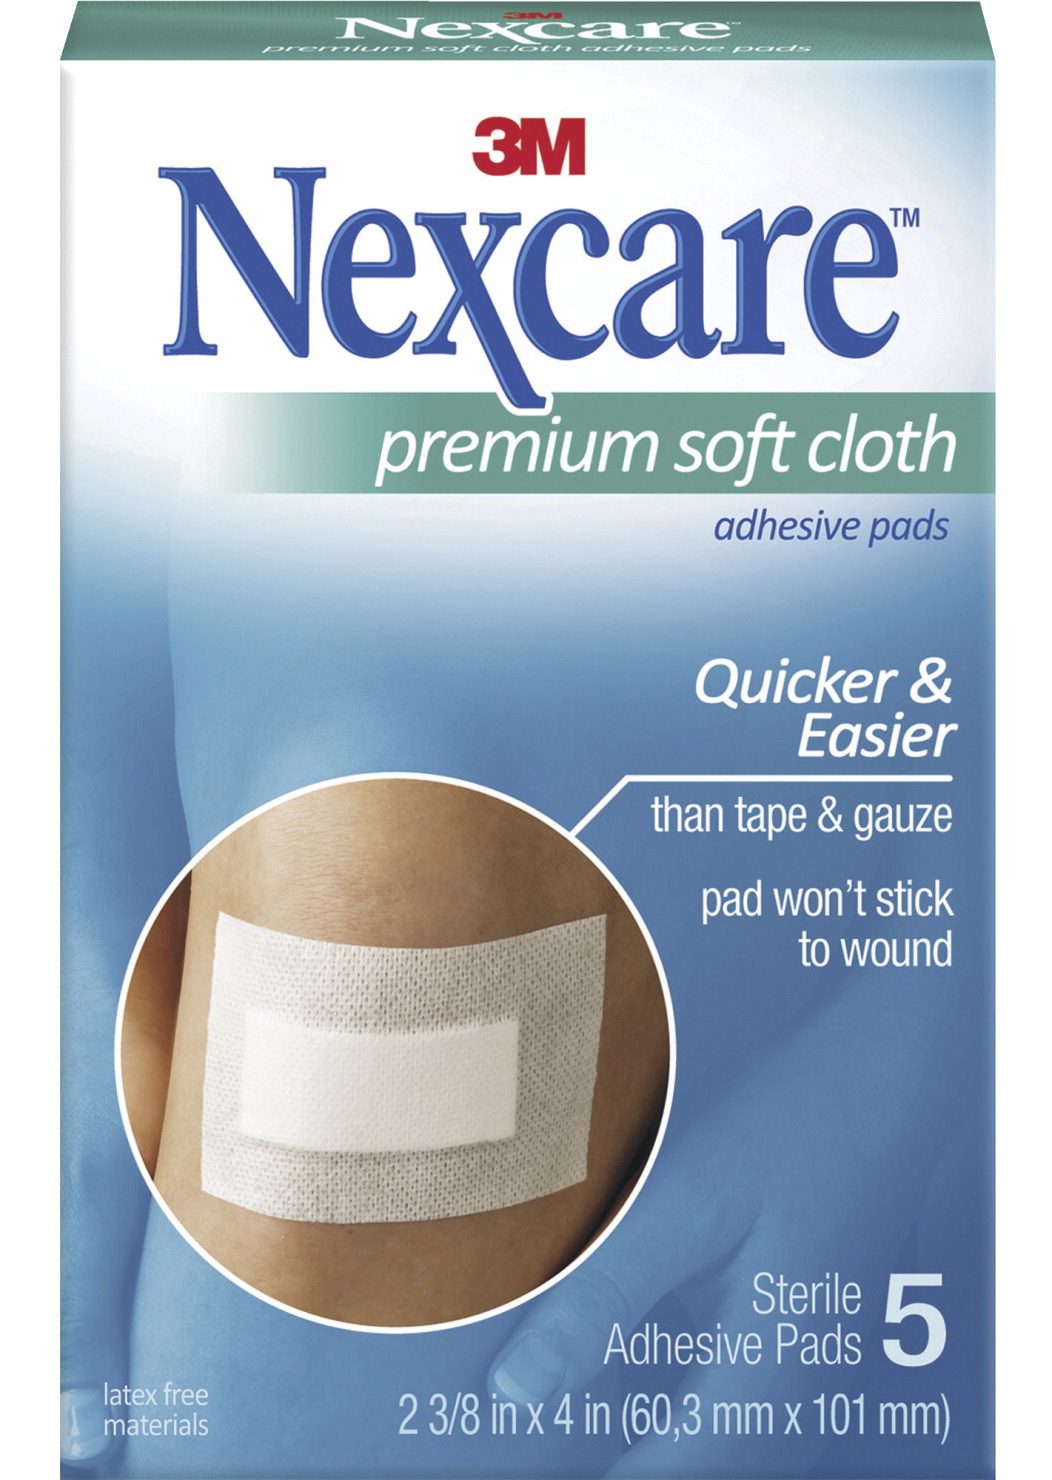 3m nexcare soft cloth premium adhesive gauze pad 3 ply 5 per pack